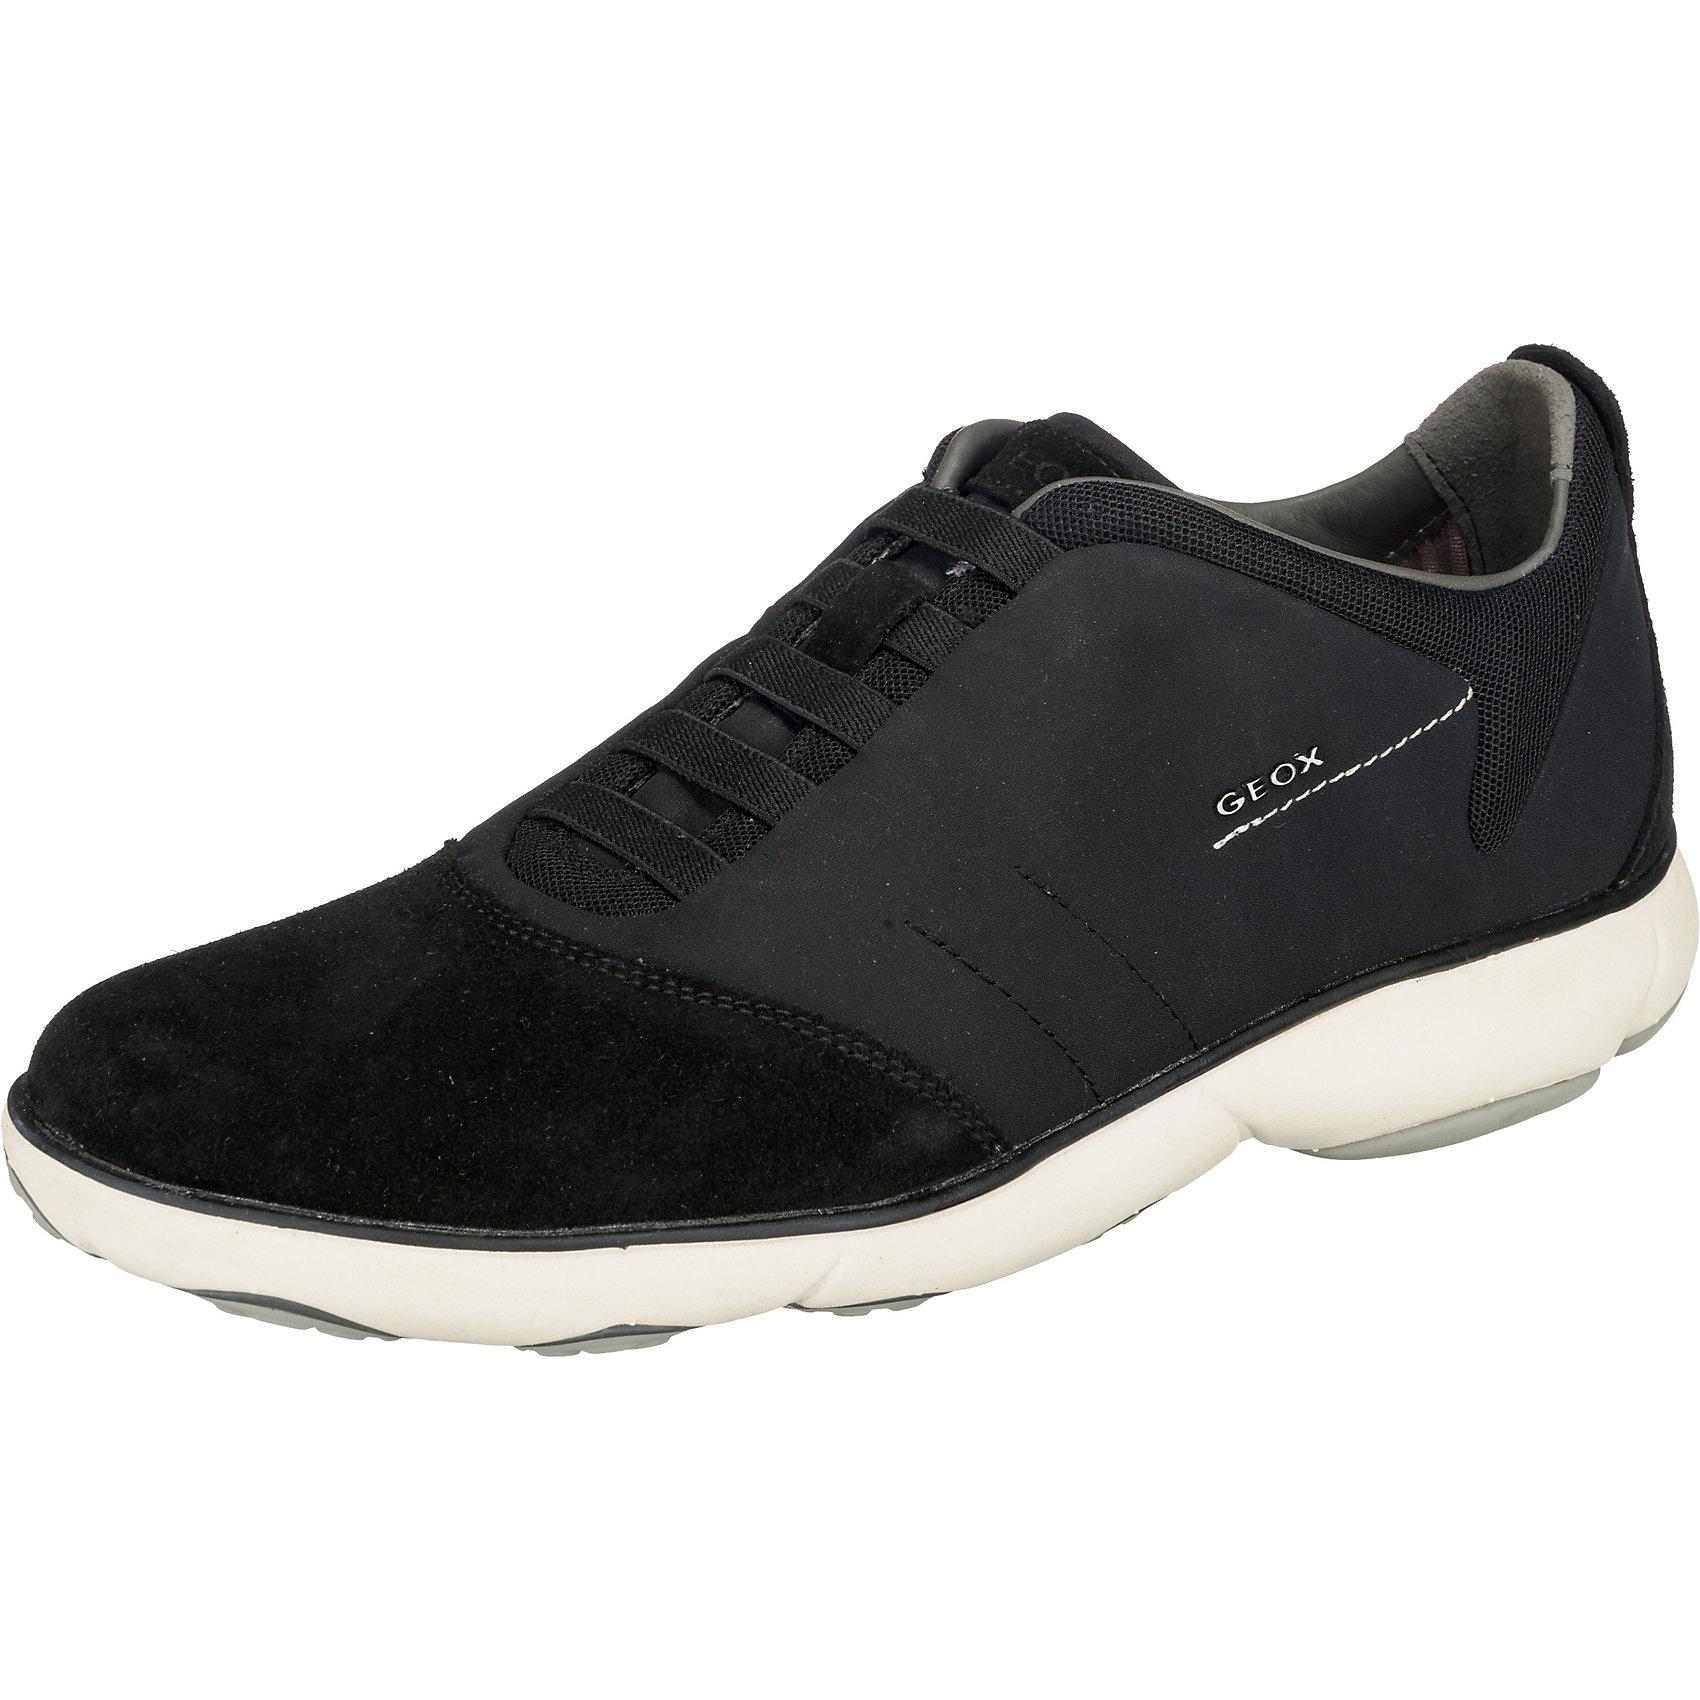 neu geox nebula sneakers low 7452938 f r herren schwarz ebay. Black Bedroom Furniture Sets. Home Design Ideas